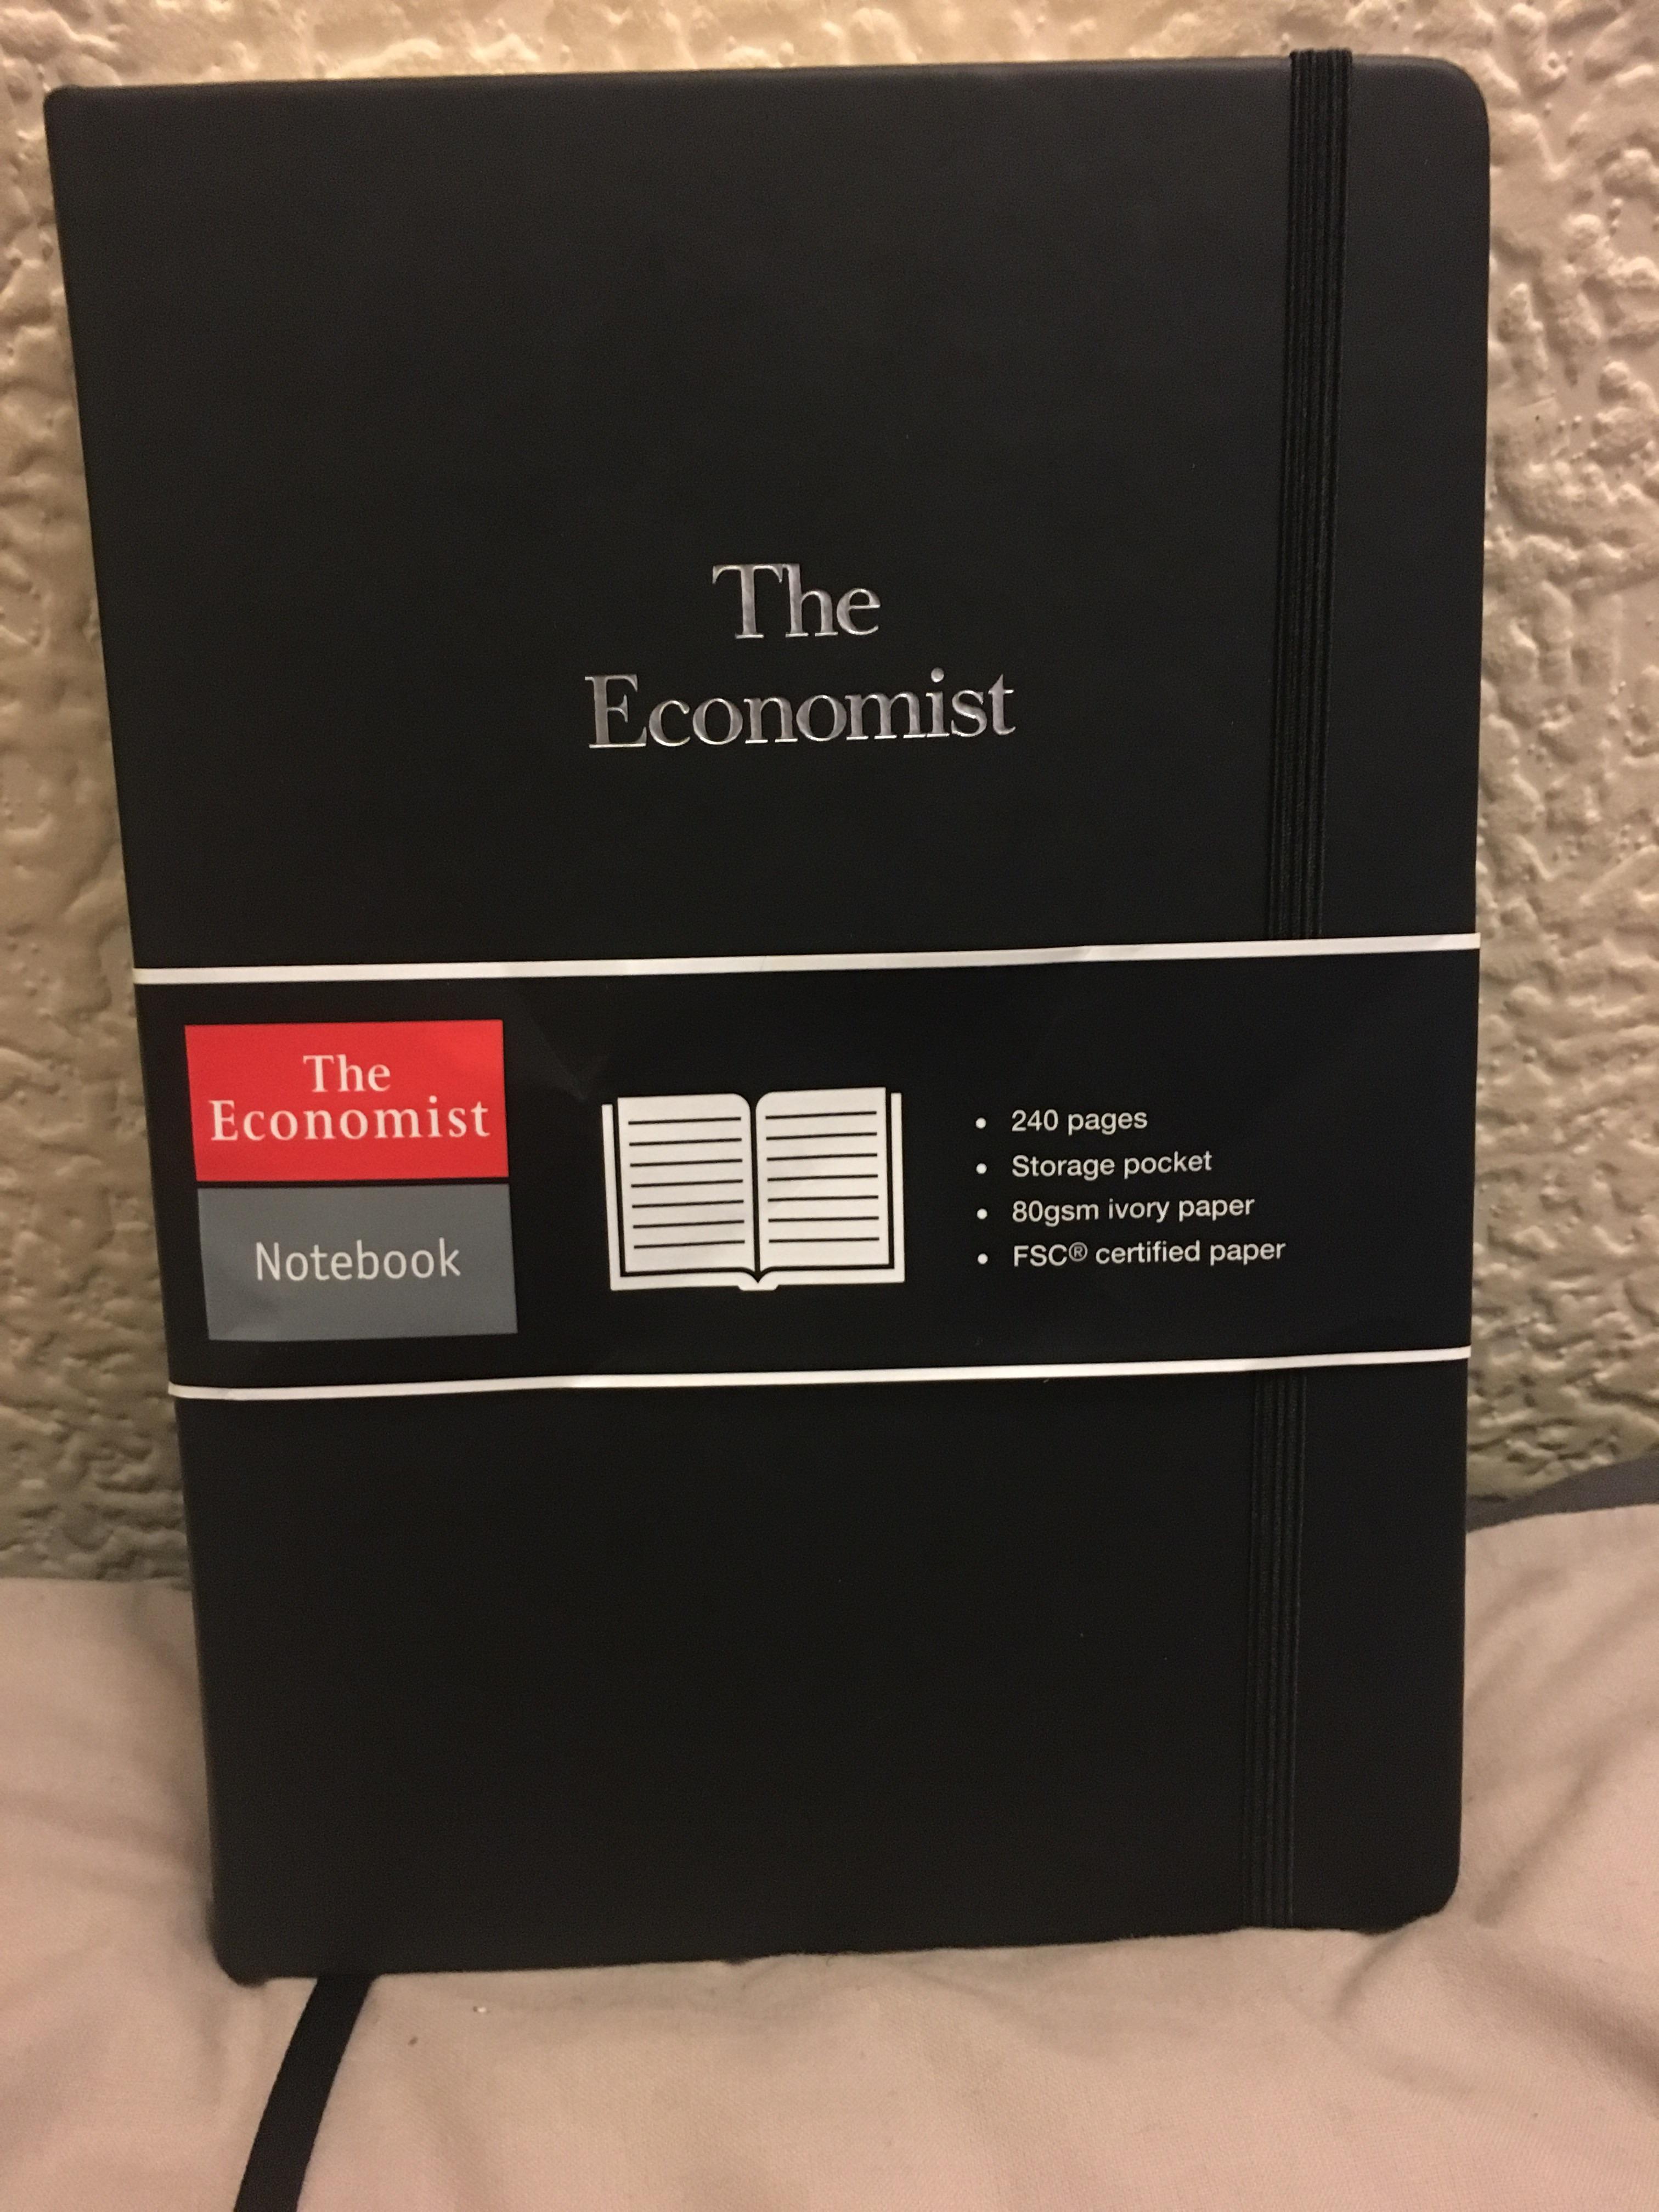 promotional the economist notebook